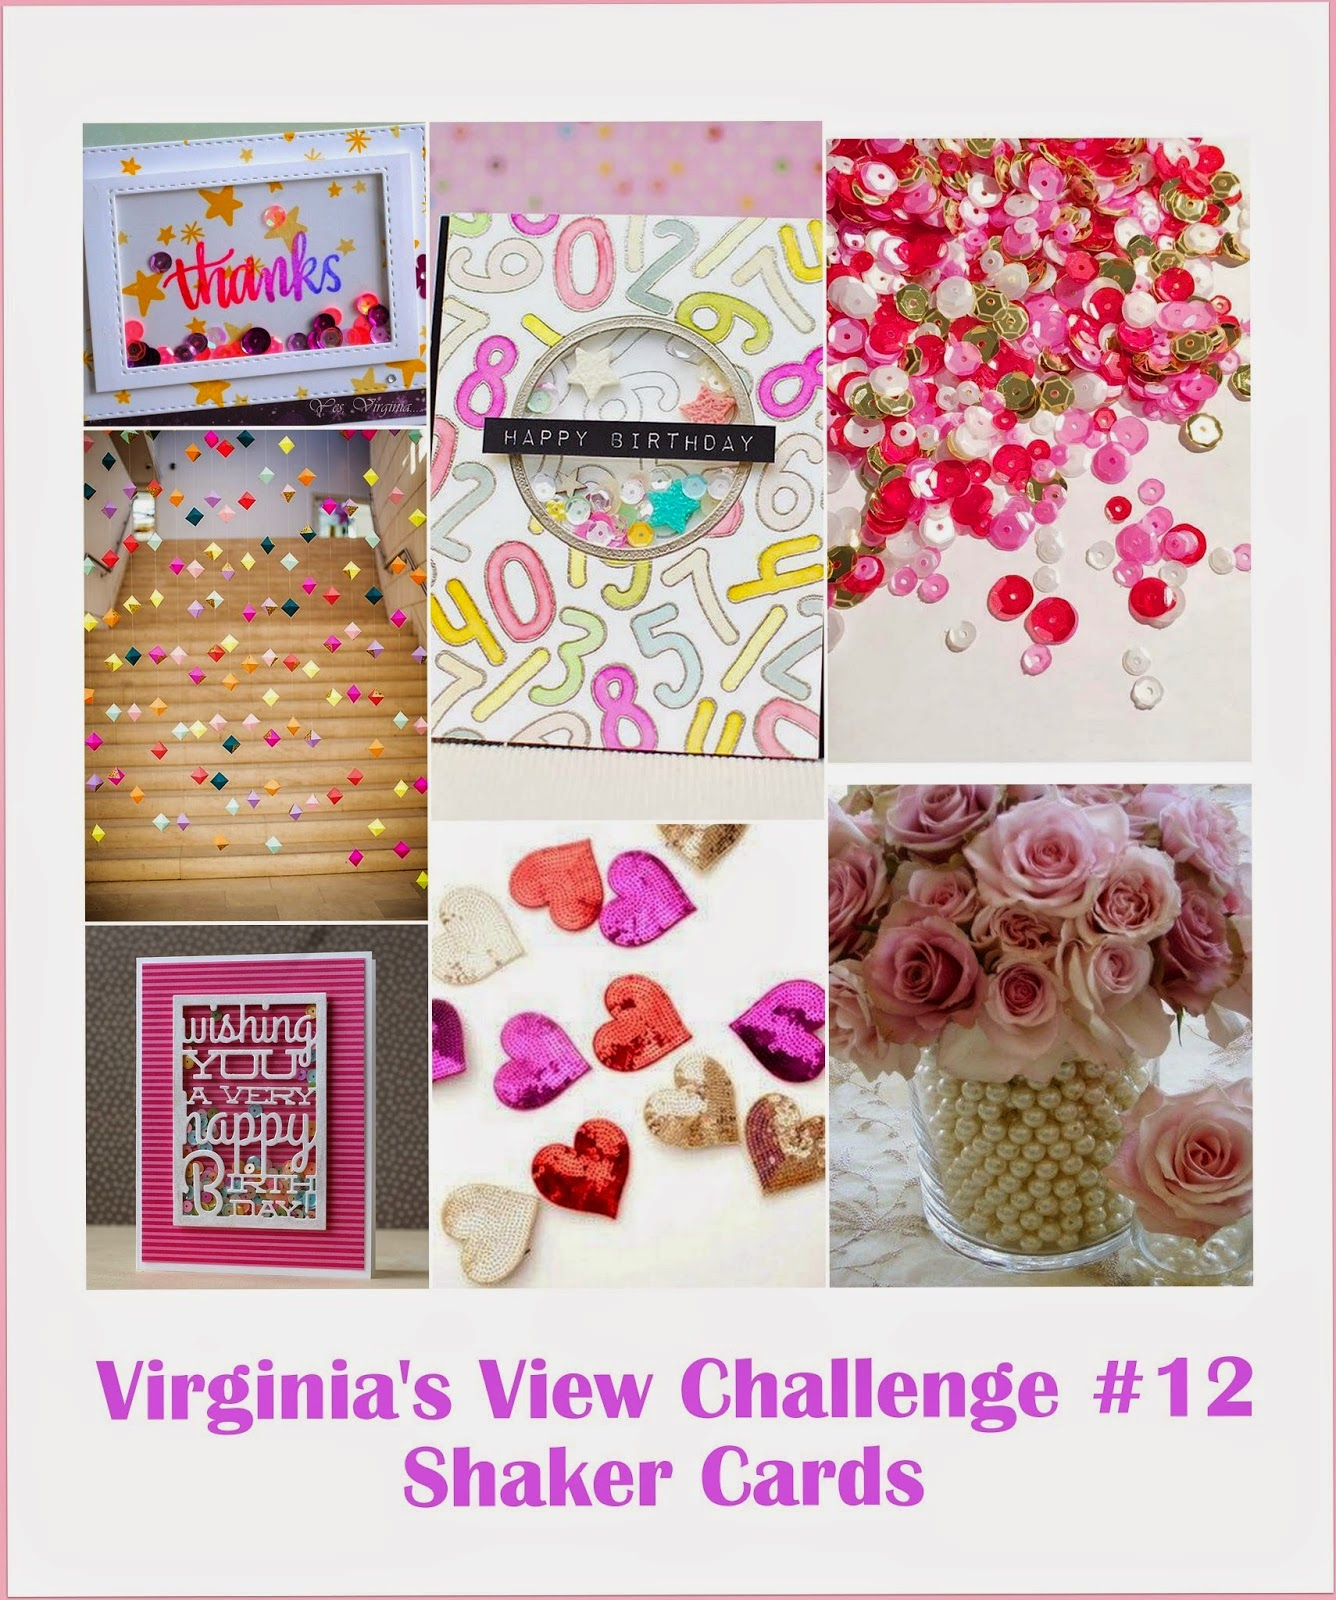 http://virginiasviewchallenge.blogspot.com.au/2015/02/virginia-view-challenge-12.html